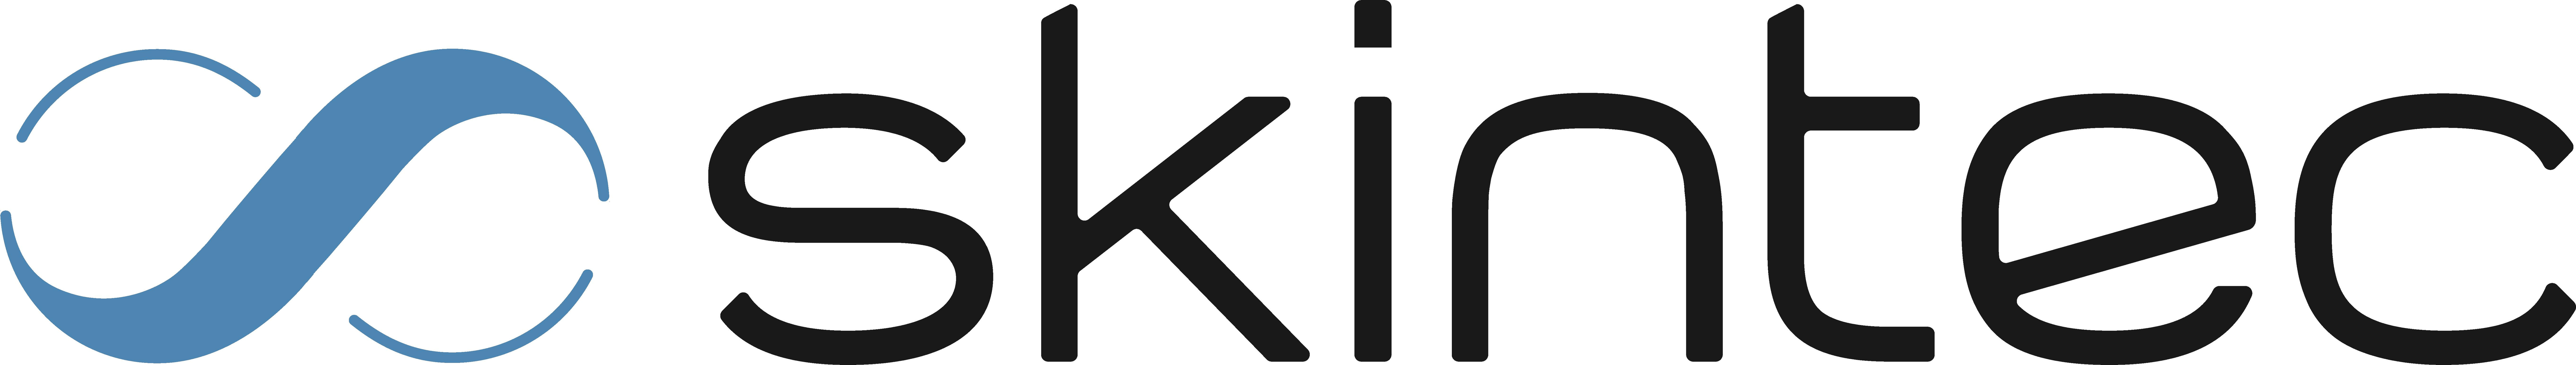 logo_skintec-2